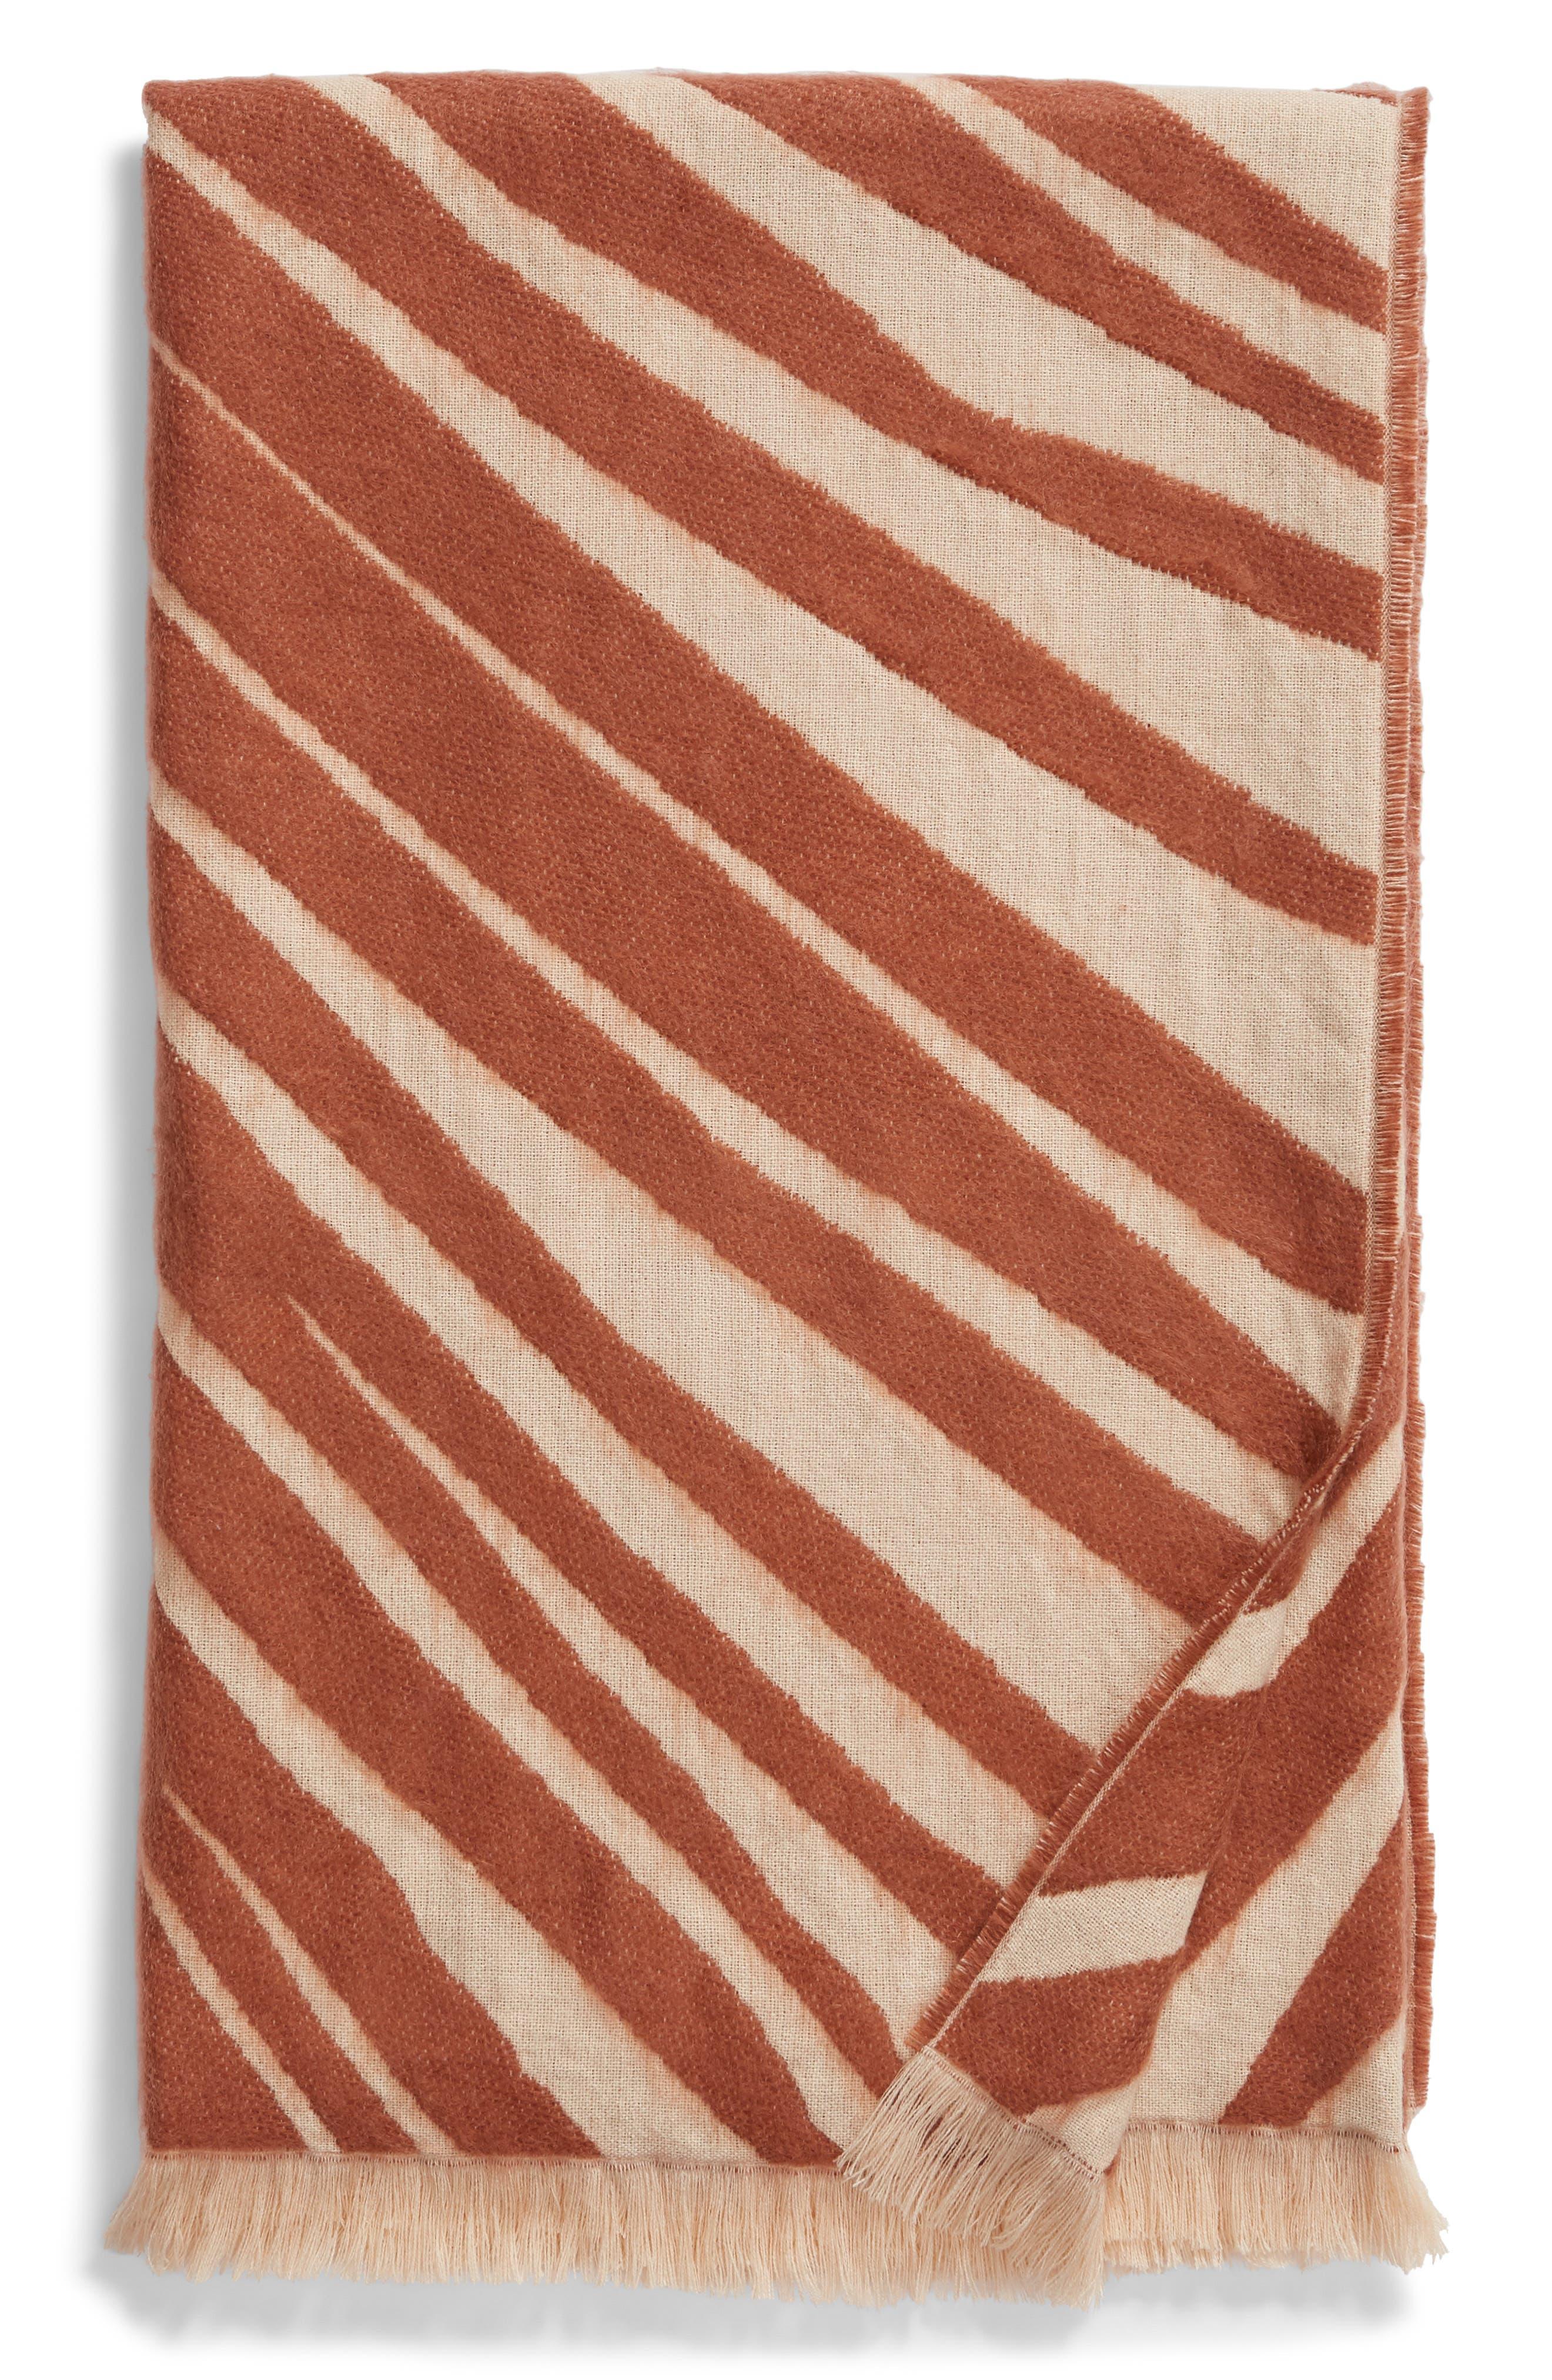 TREASURE & BOND, Palm Leaf Jacquard Throw Blanket, Main thumbnail 1, color, BEIGE DUNE MULTI